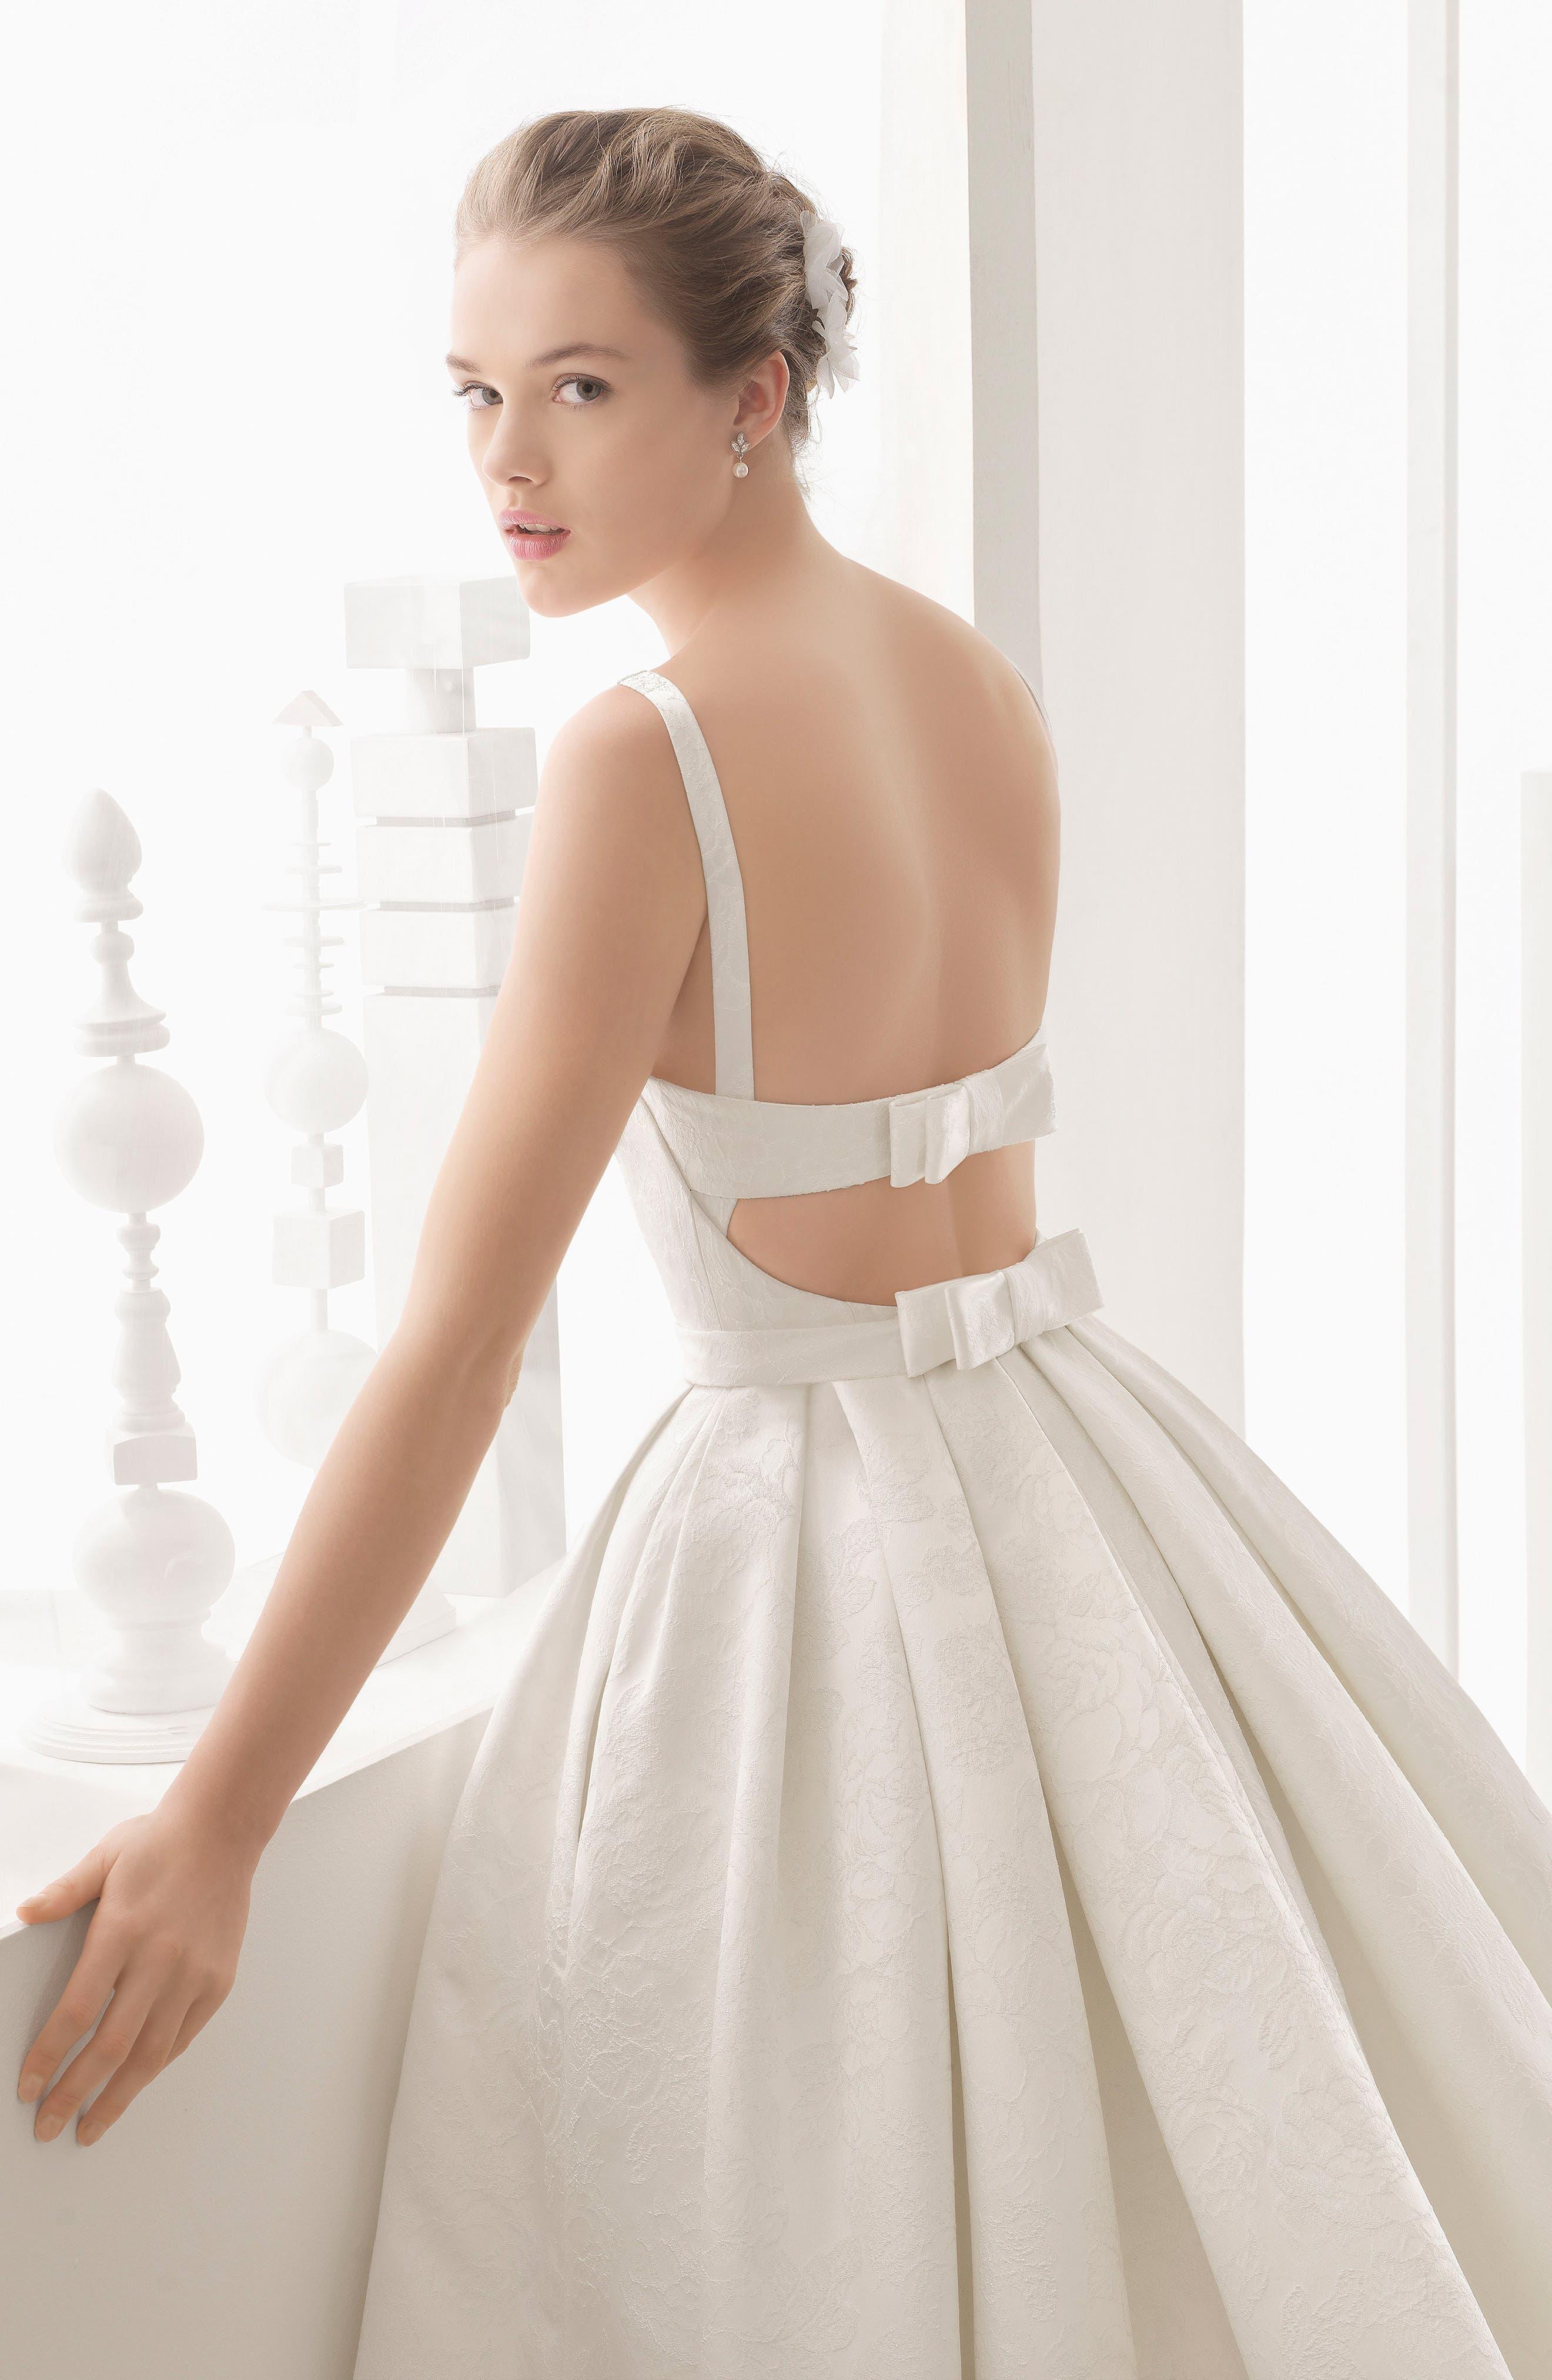 Nazar Floral Brocade Sleeveless Gown,                             Alternate thumbnail 3, color,                             900